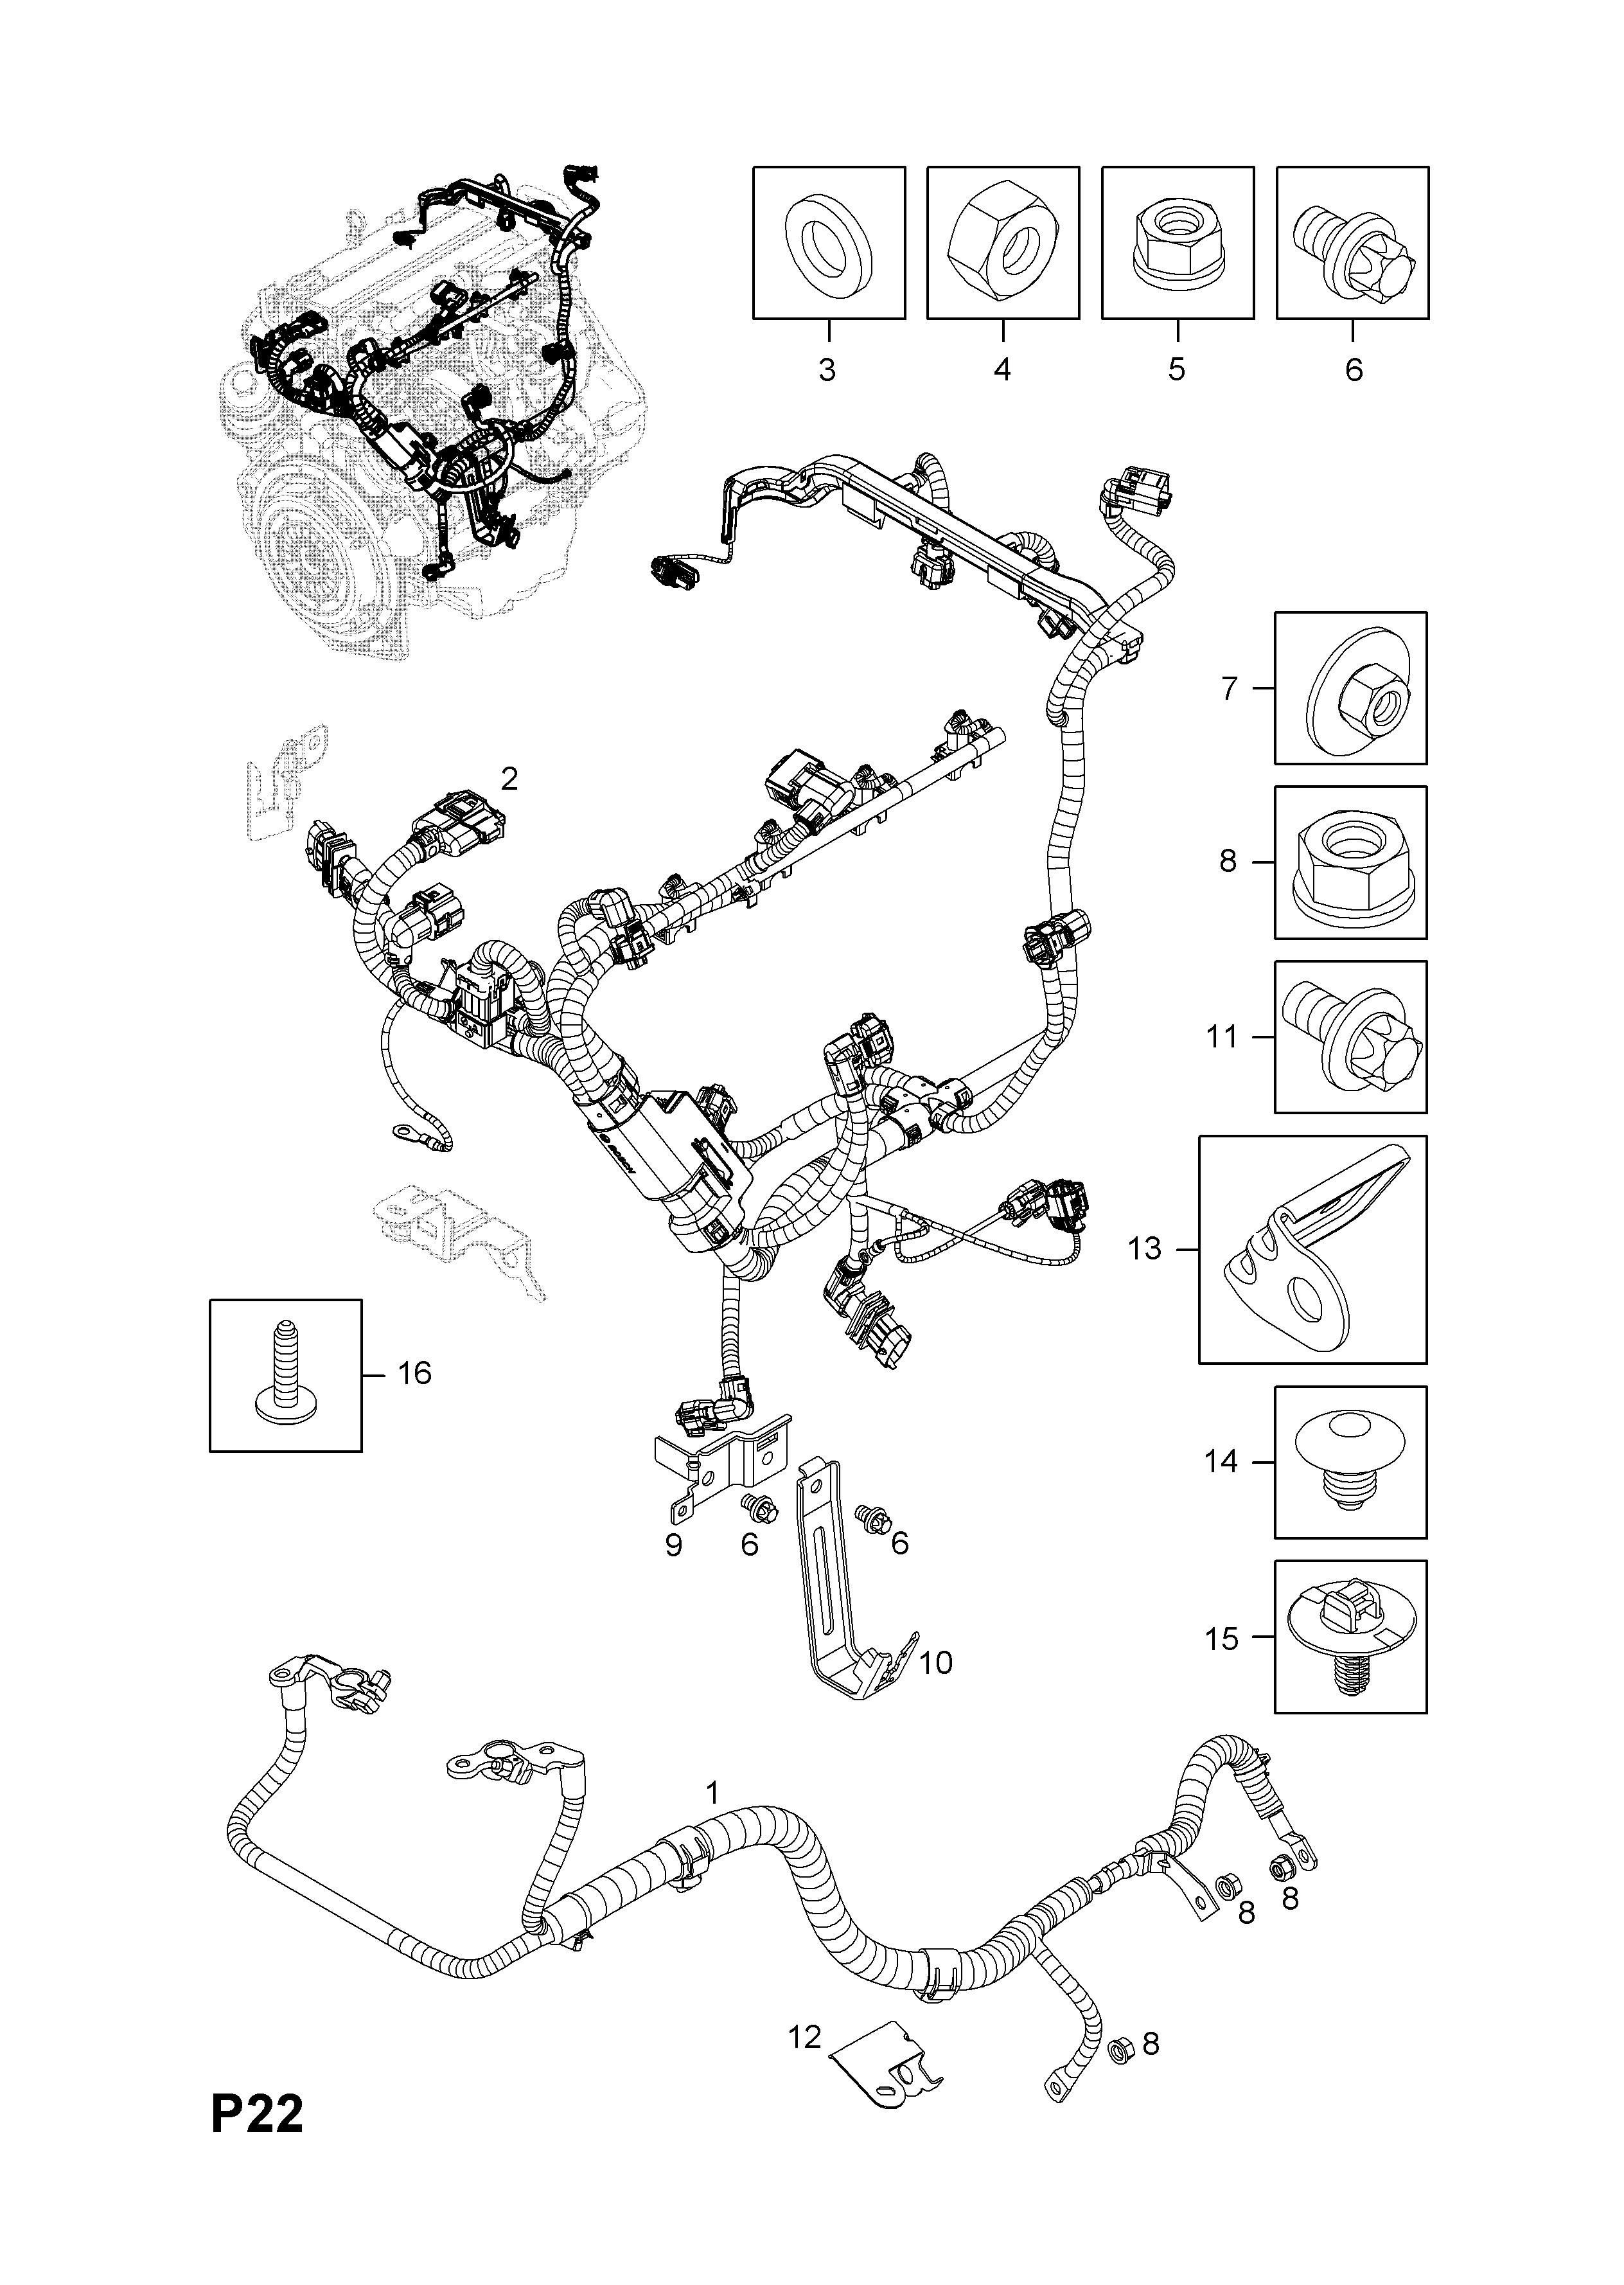 corsa d w0l0sdl0876011222 p electrical 9 wiring harness 12 engine rh catcar info engine wiring harness damage engine wiring harness definition